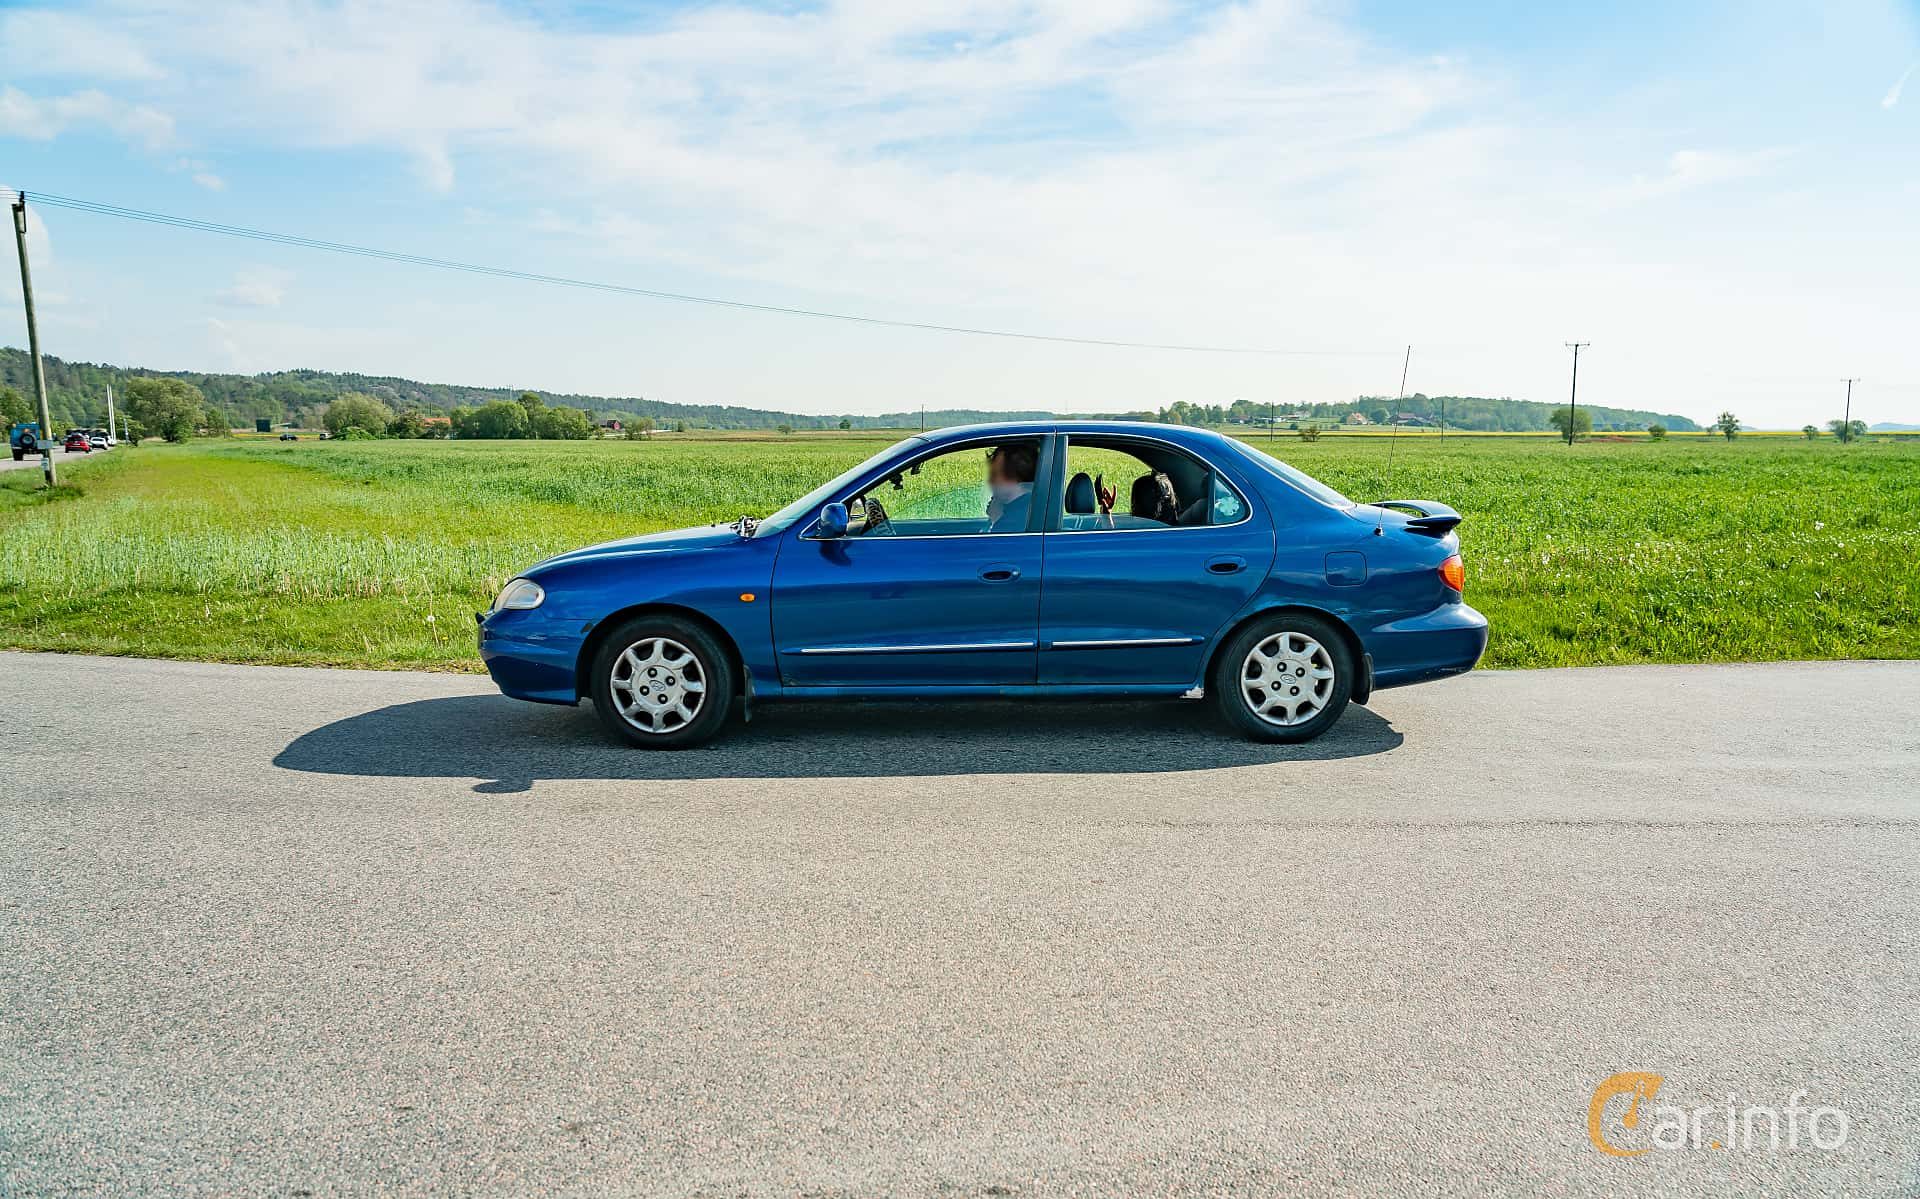 Hyundai Elantra Sedan 1.8 Manual, 129hp, 2000 at Tjolöholm Classic Motor 2019